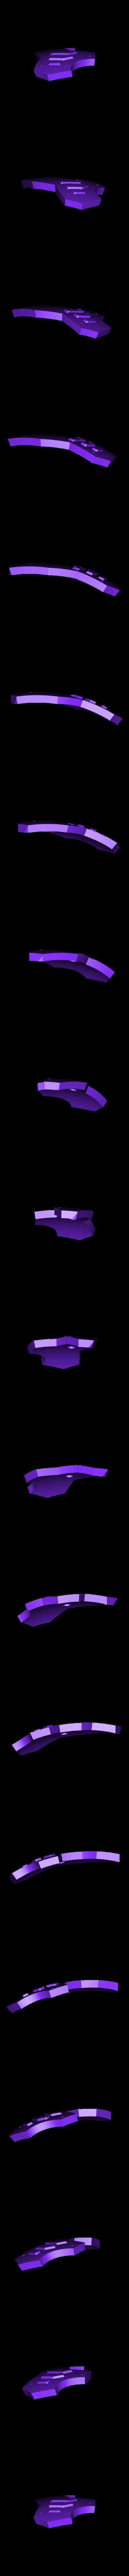 LegShield-RightBack.stl Download STL file Hammond's Wrecking Ball Mech from Overwatch • 3D printer template, FunbieStudios